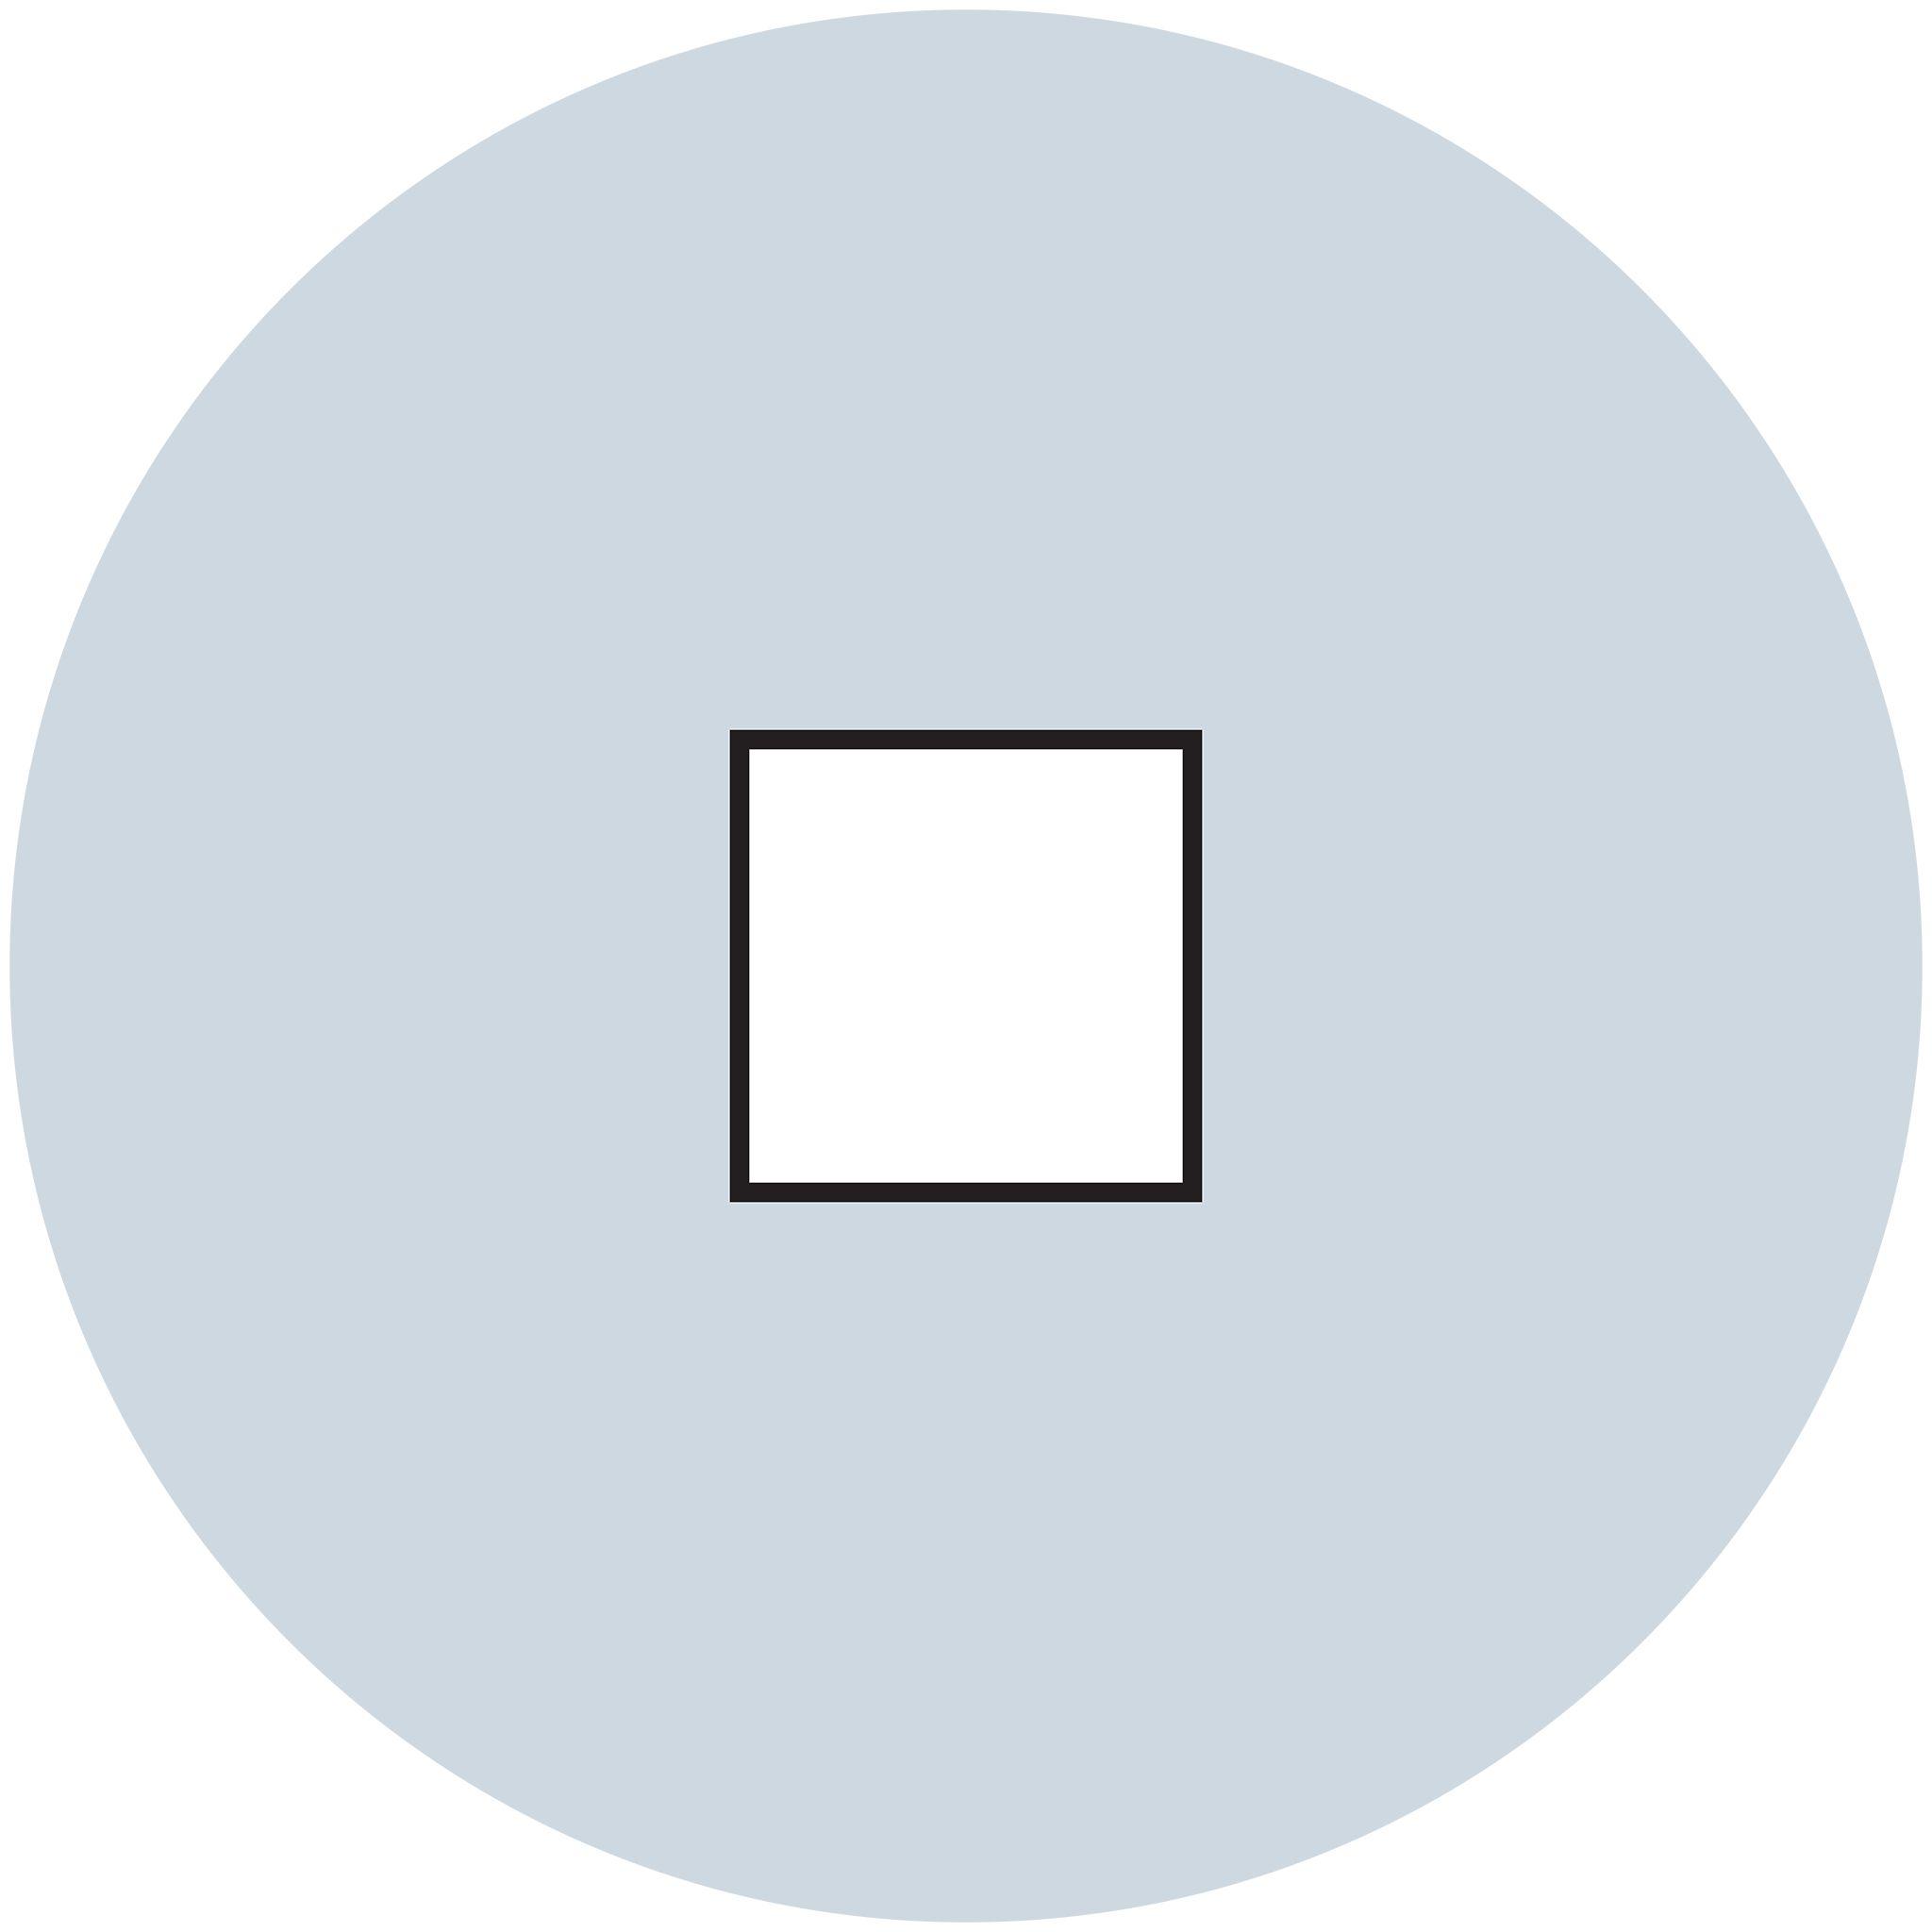 Obround Holes Example